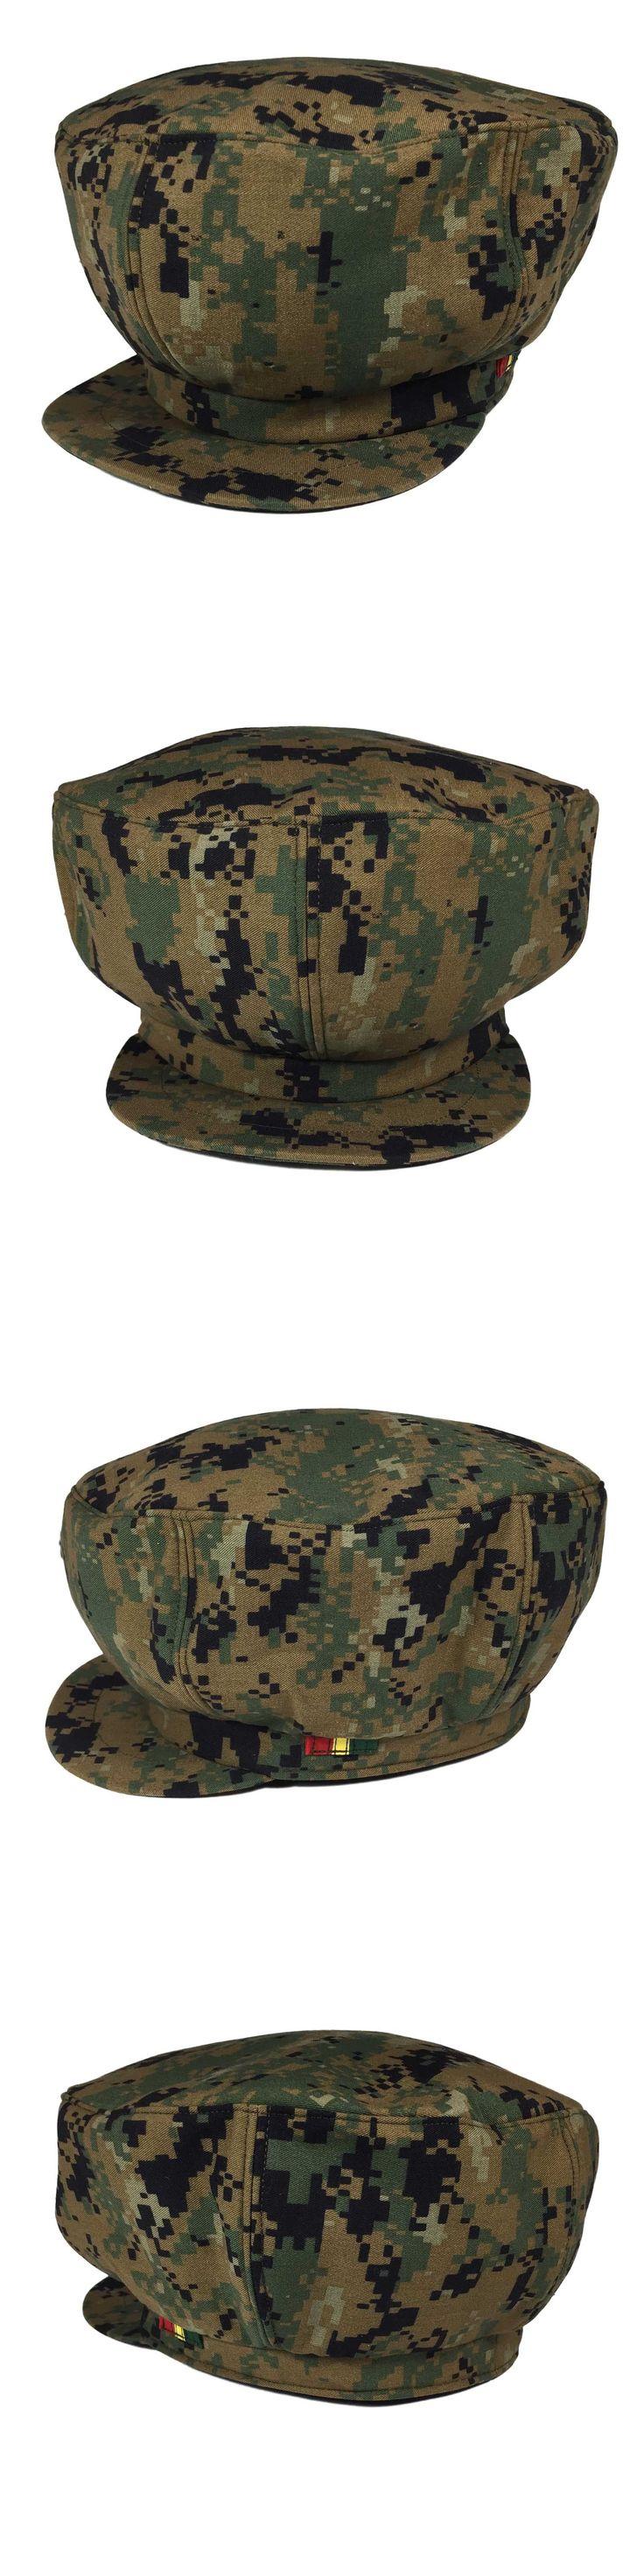 Hats 163543: Rasta Hat Cap Applejack Africa Rastafari Dubwise Reggae Jamaica Negus Marley Lg -> BUY IT NOW ONLY: $64.99 on eBay!